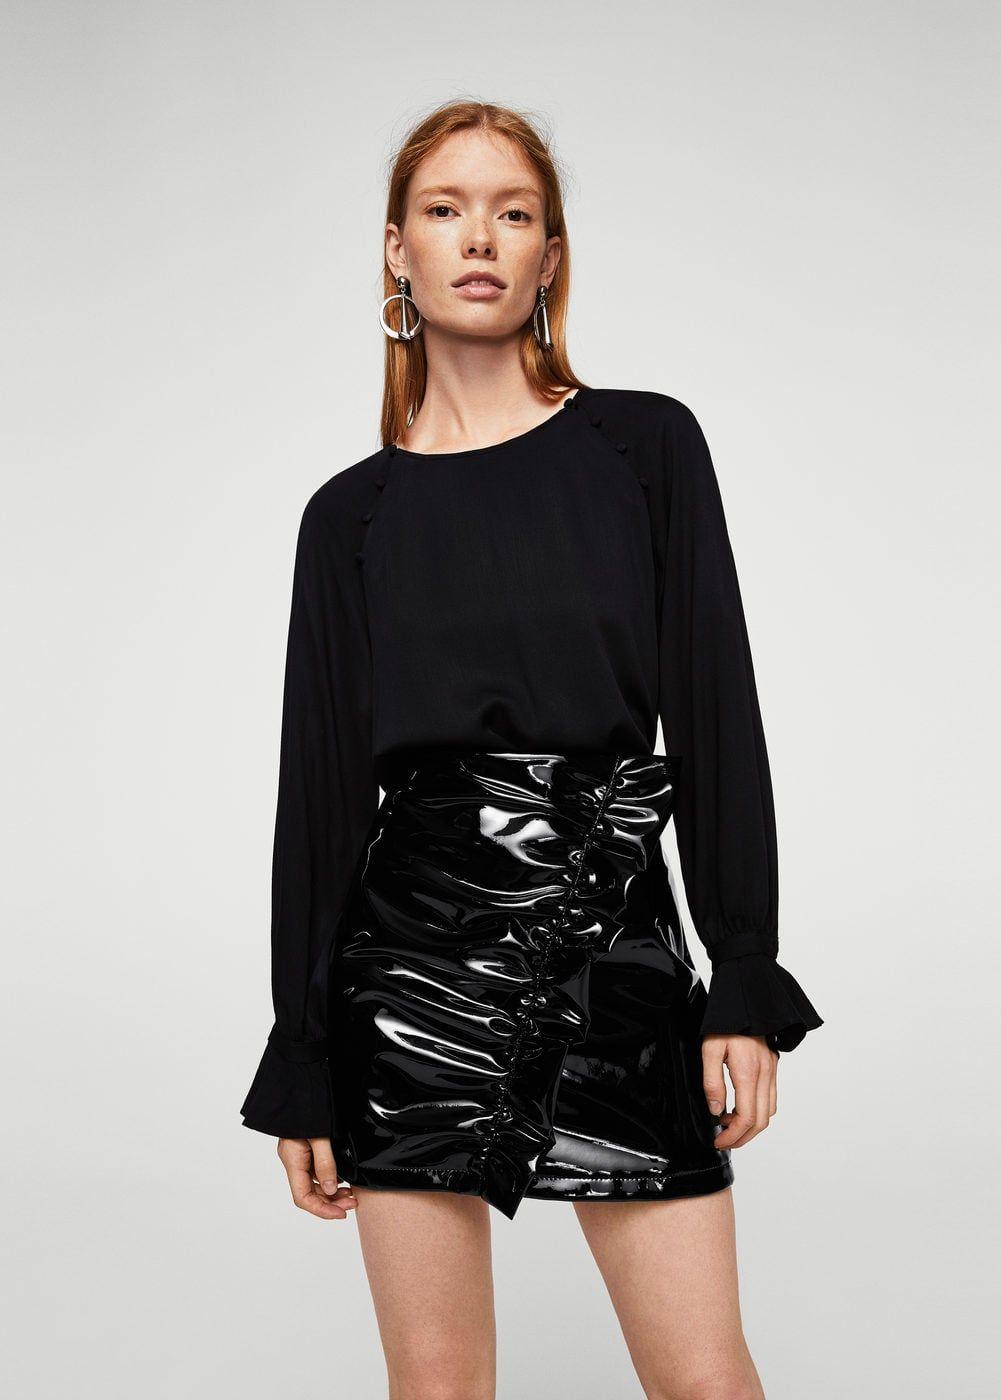 Draped vinyl skirt - Women  1842b2f285a